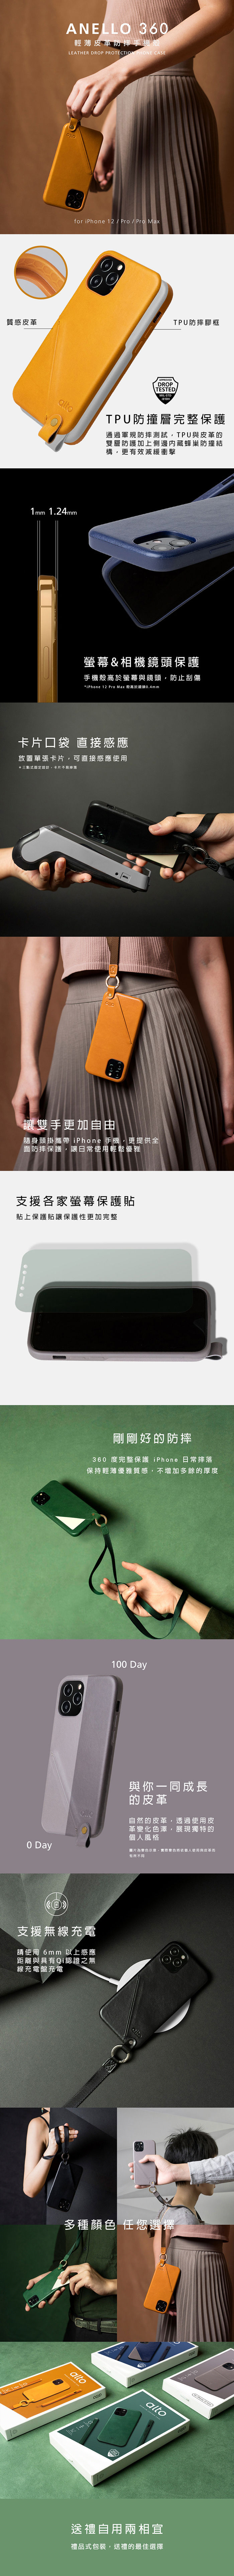 Alto|iPhone 12 Pro Max 6.7吋 頸掛卡插皮革防摔手機殼Anello 360 - (礫石灰) (附頸掛繩)